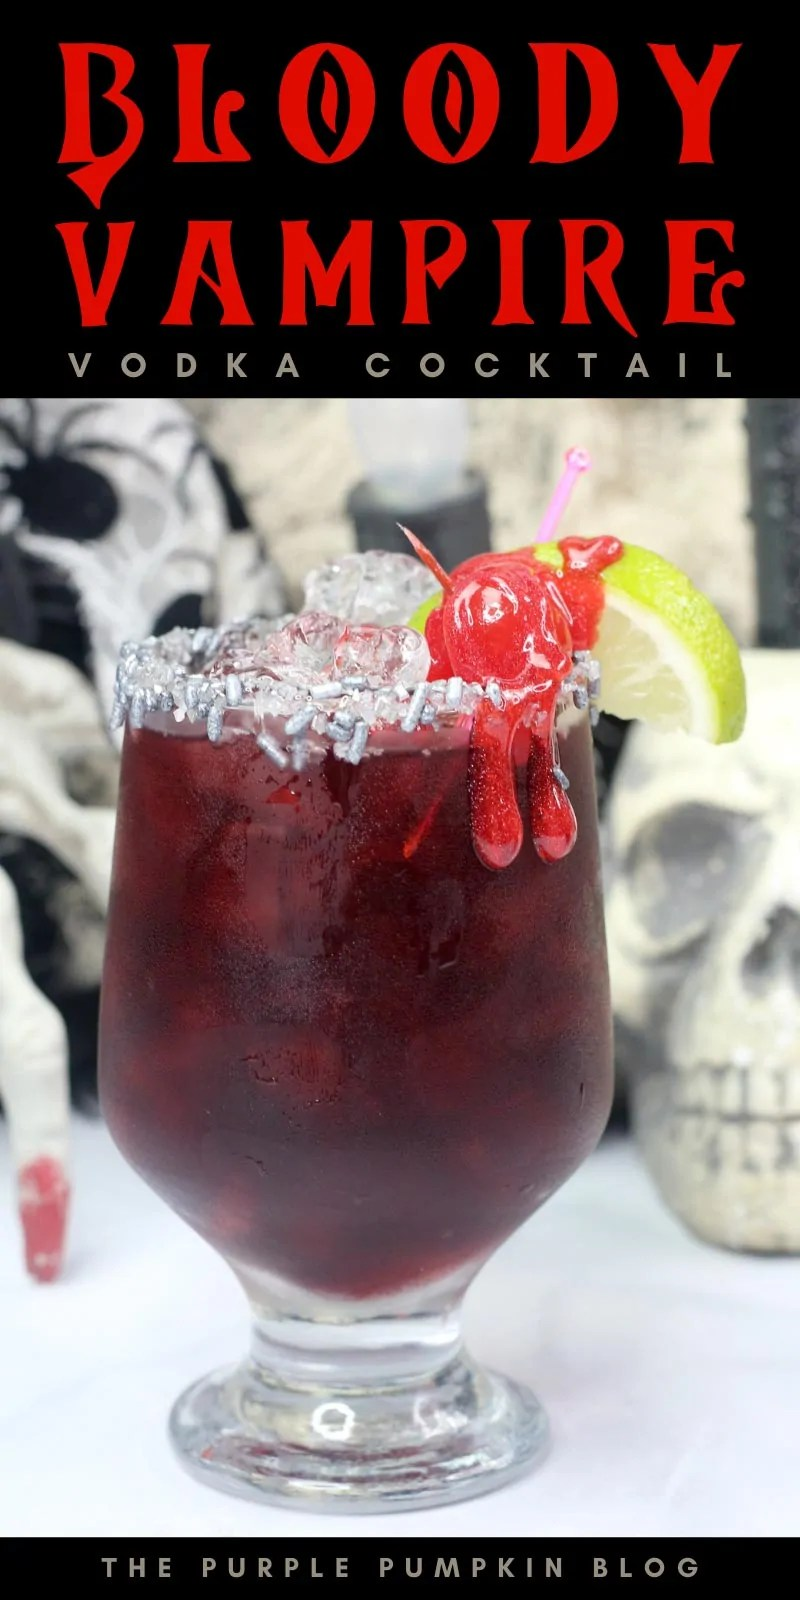 red vodka cocktail